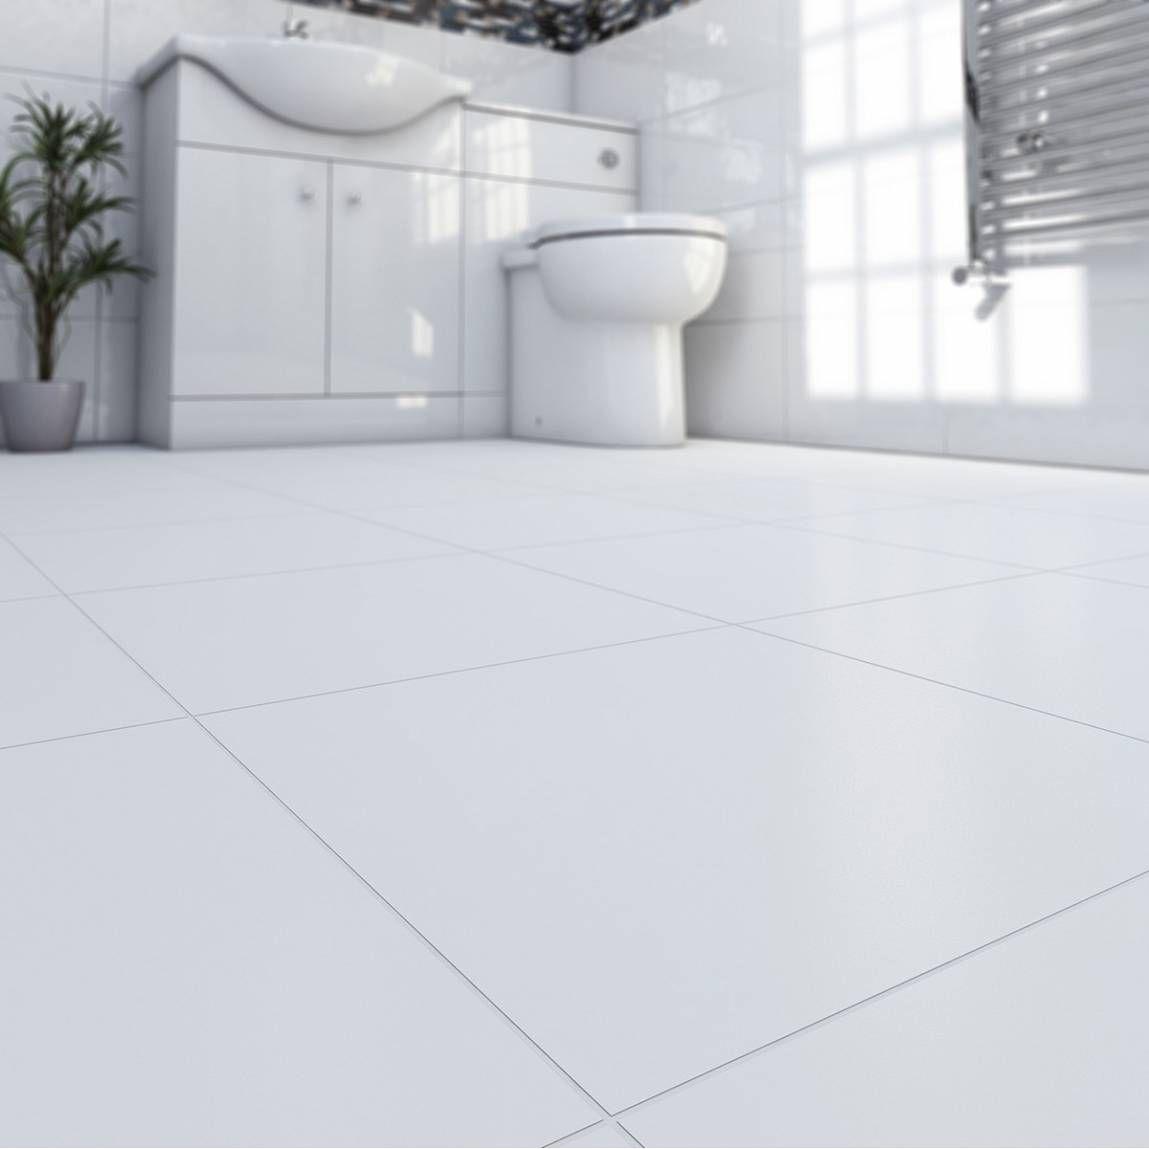 white tile floors - Google Search | Bathrooms | Pinterest | White ...